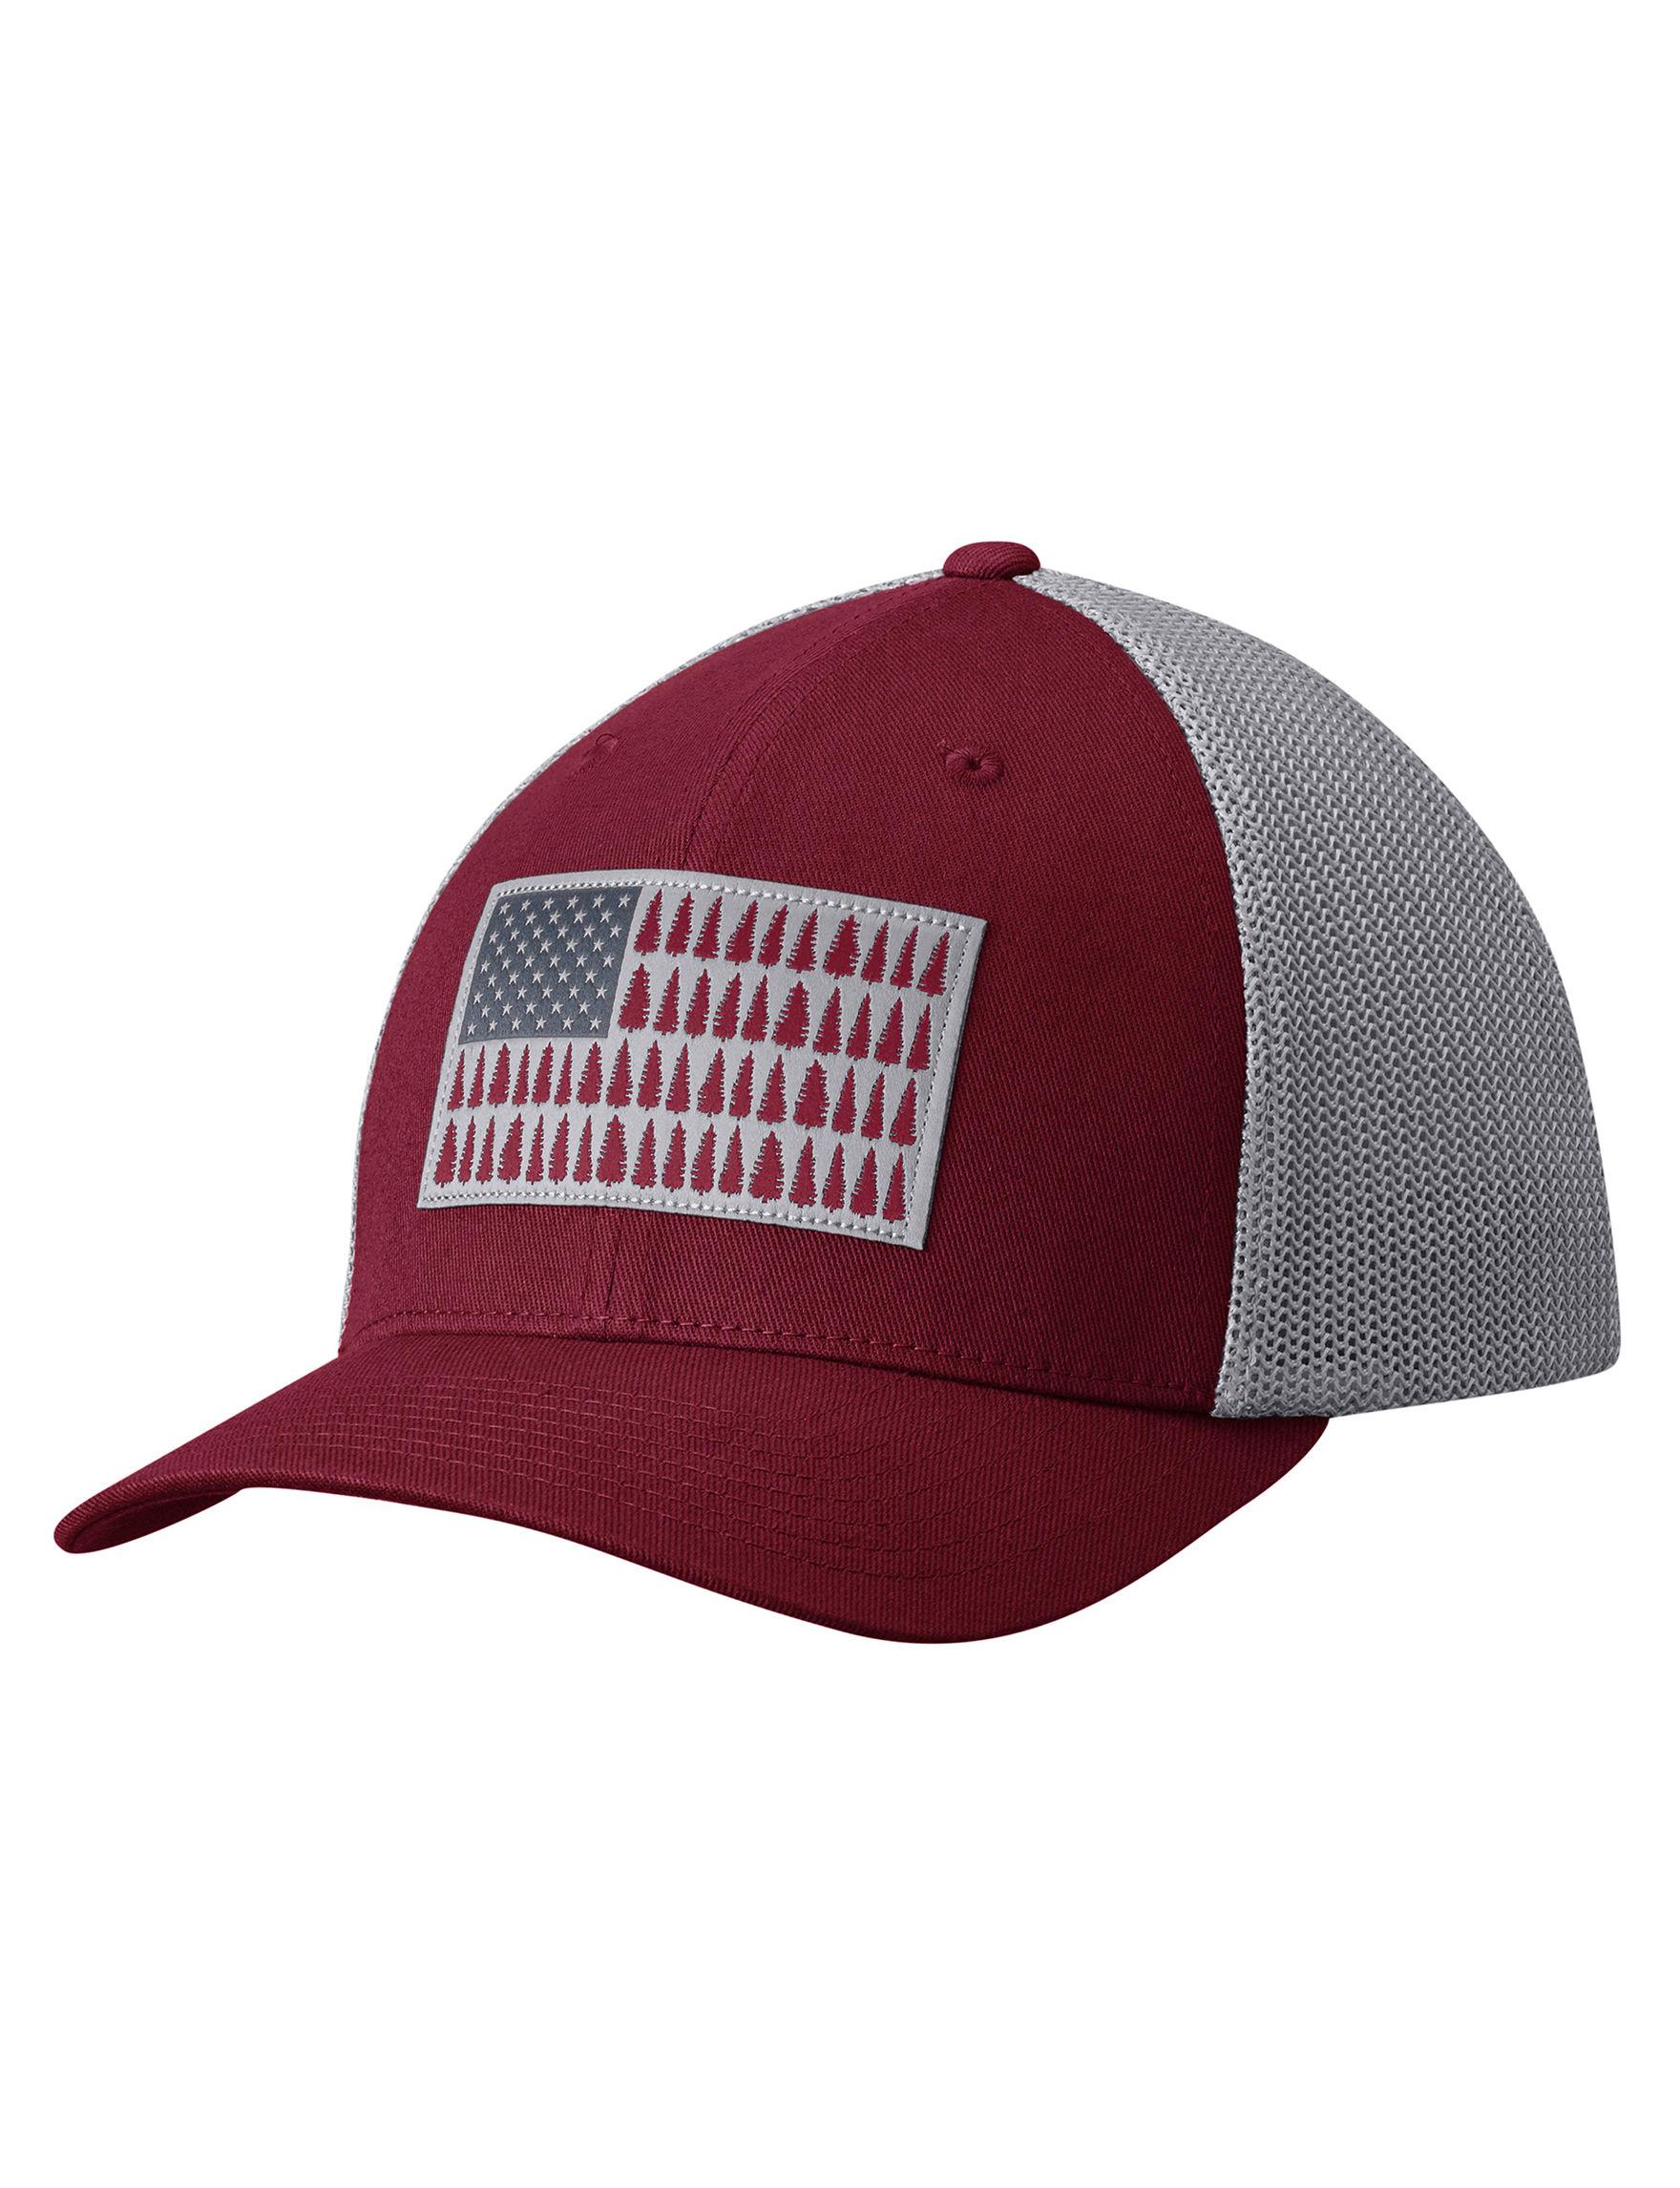 Columbia Burgundy Hats & Headwear Baseball Caps